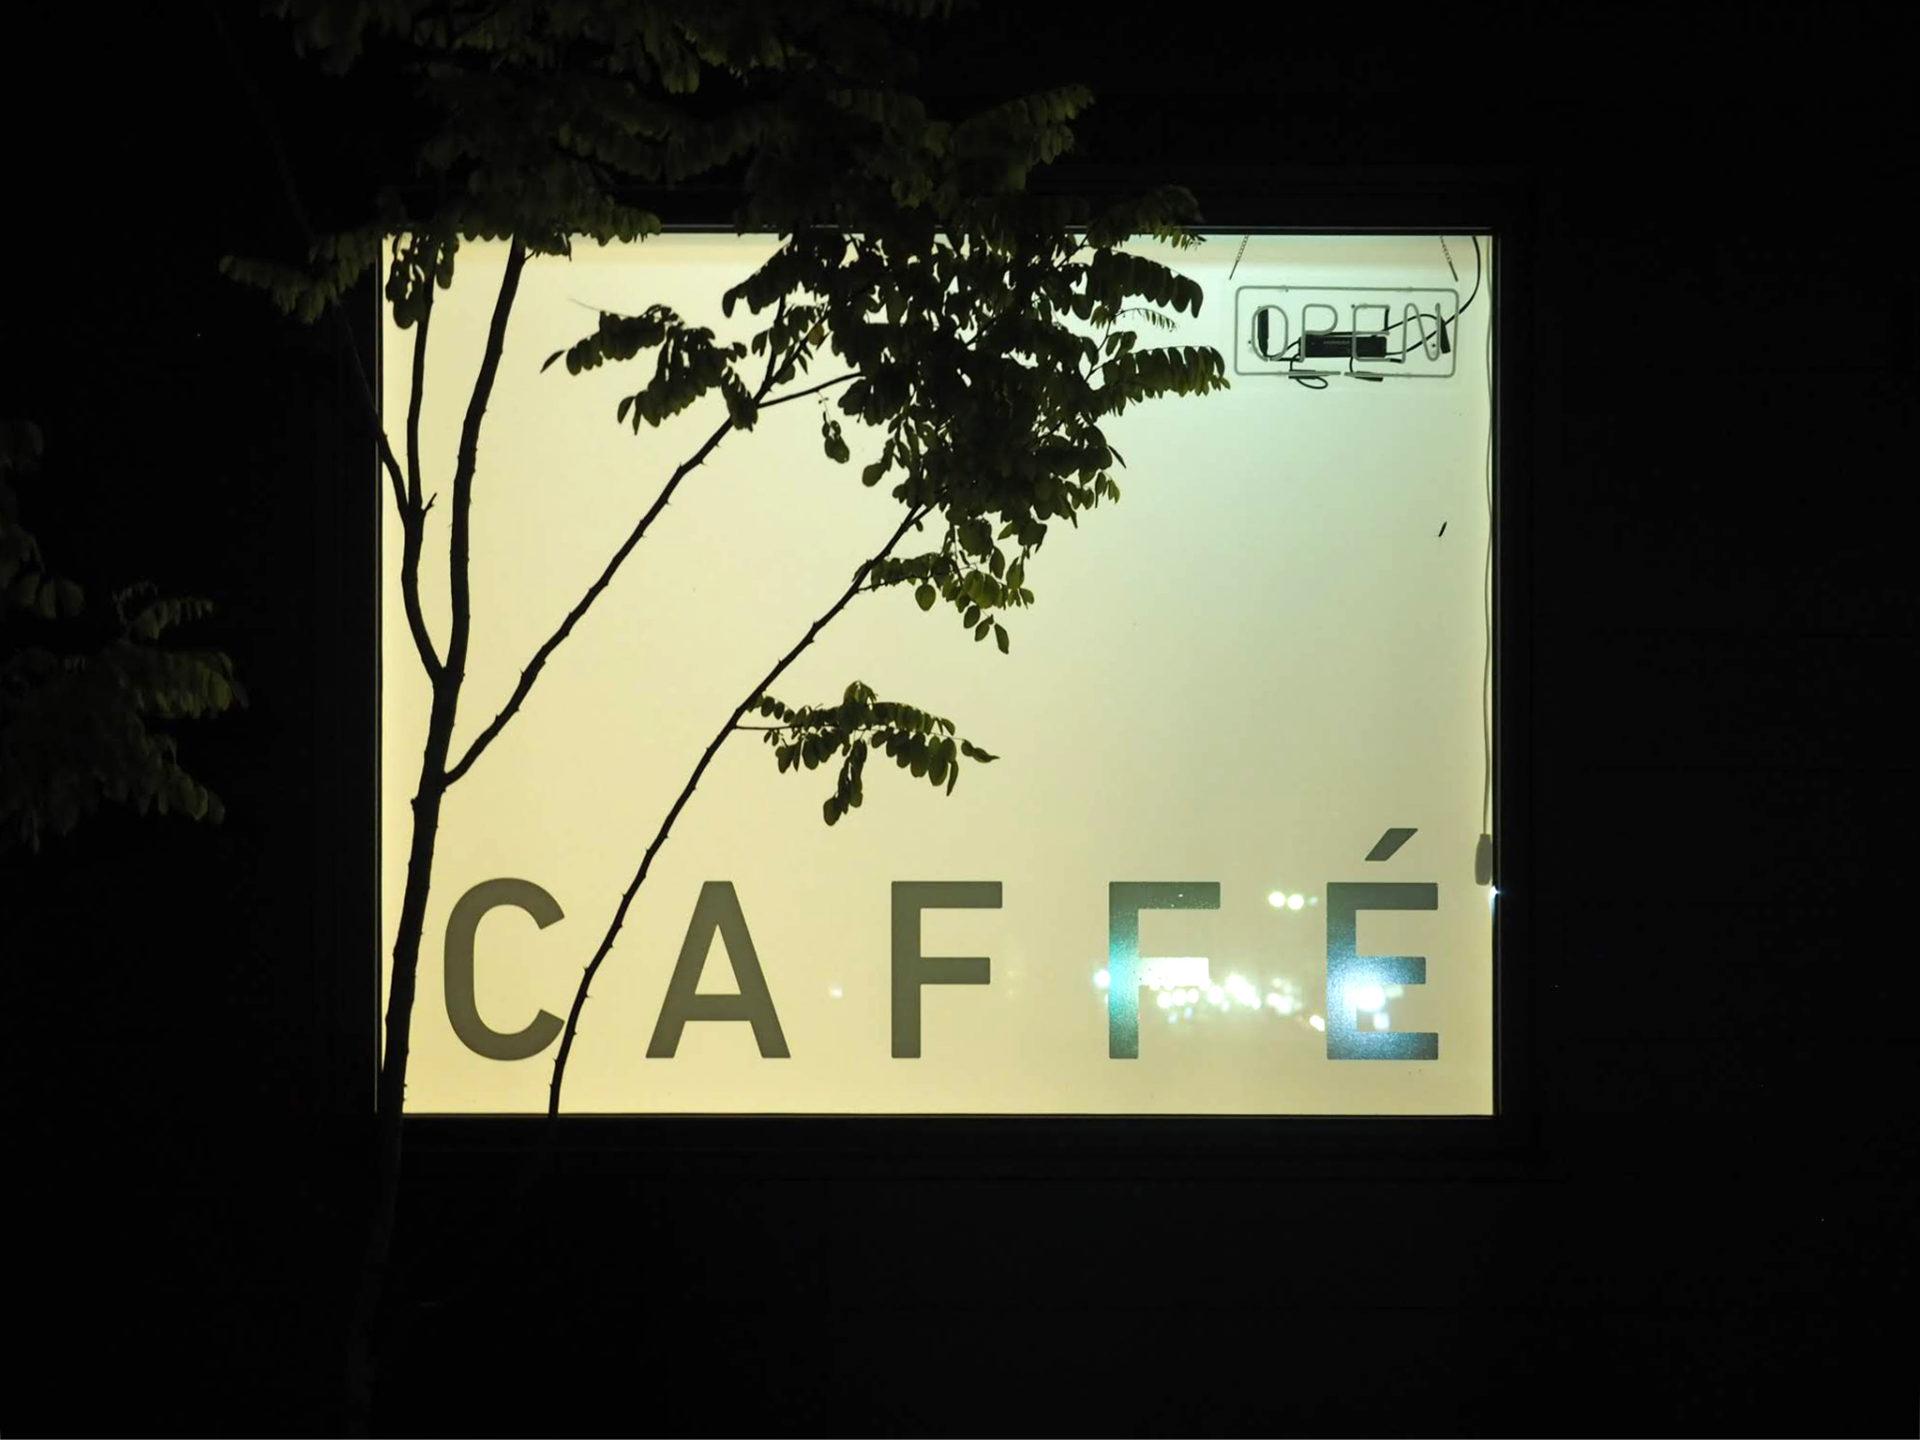 B.W.C.L スペシャルティコーヒー 《Wake up roast》